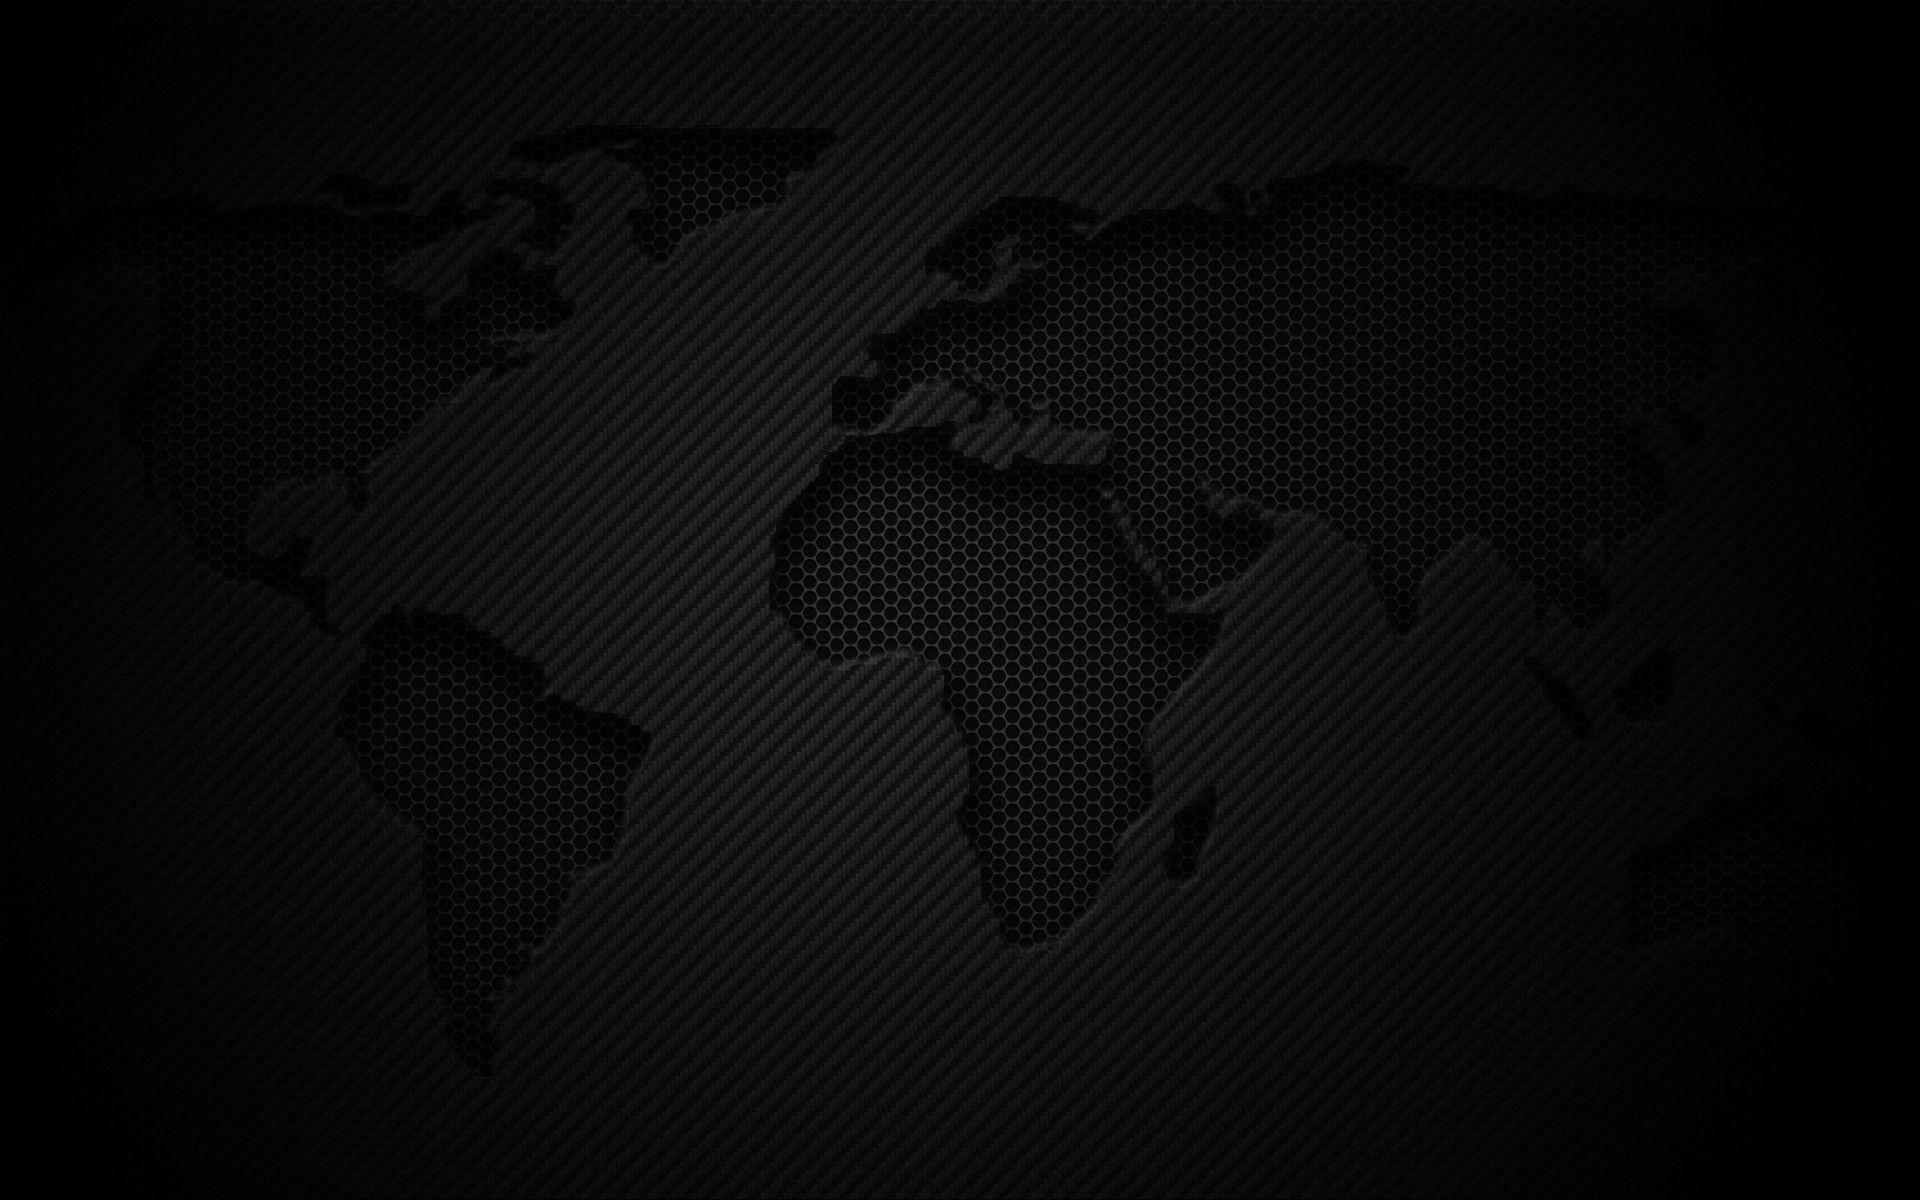 Res 1920x1200 Desktop Wallpaper Winter Wallpaper Computer 17308 High Quality Black Hd Wallpaper Black Wallpaper World Map Wallpaper